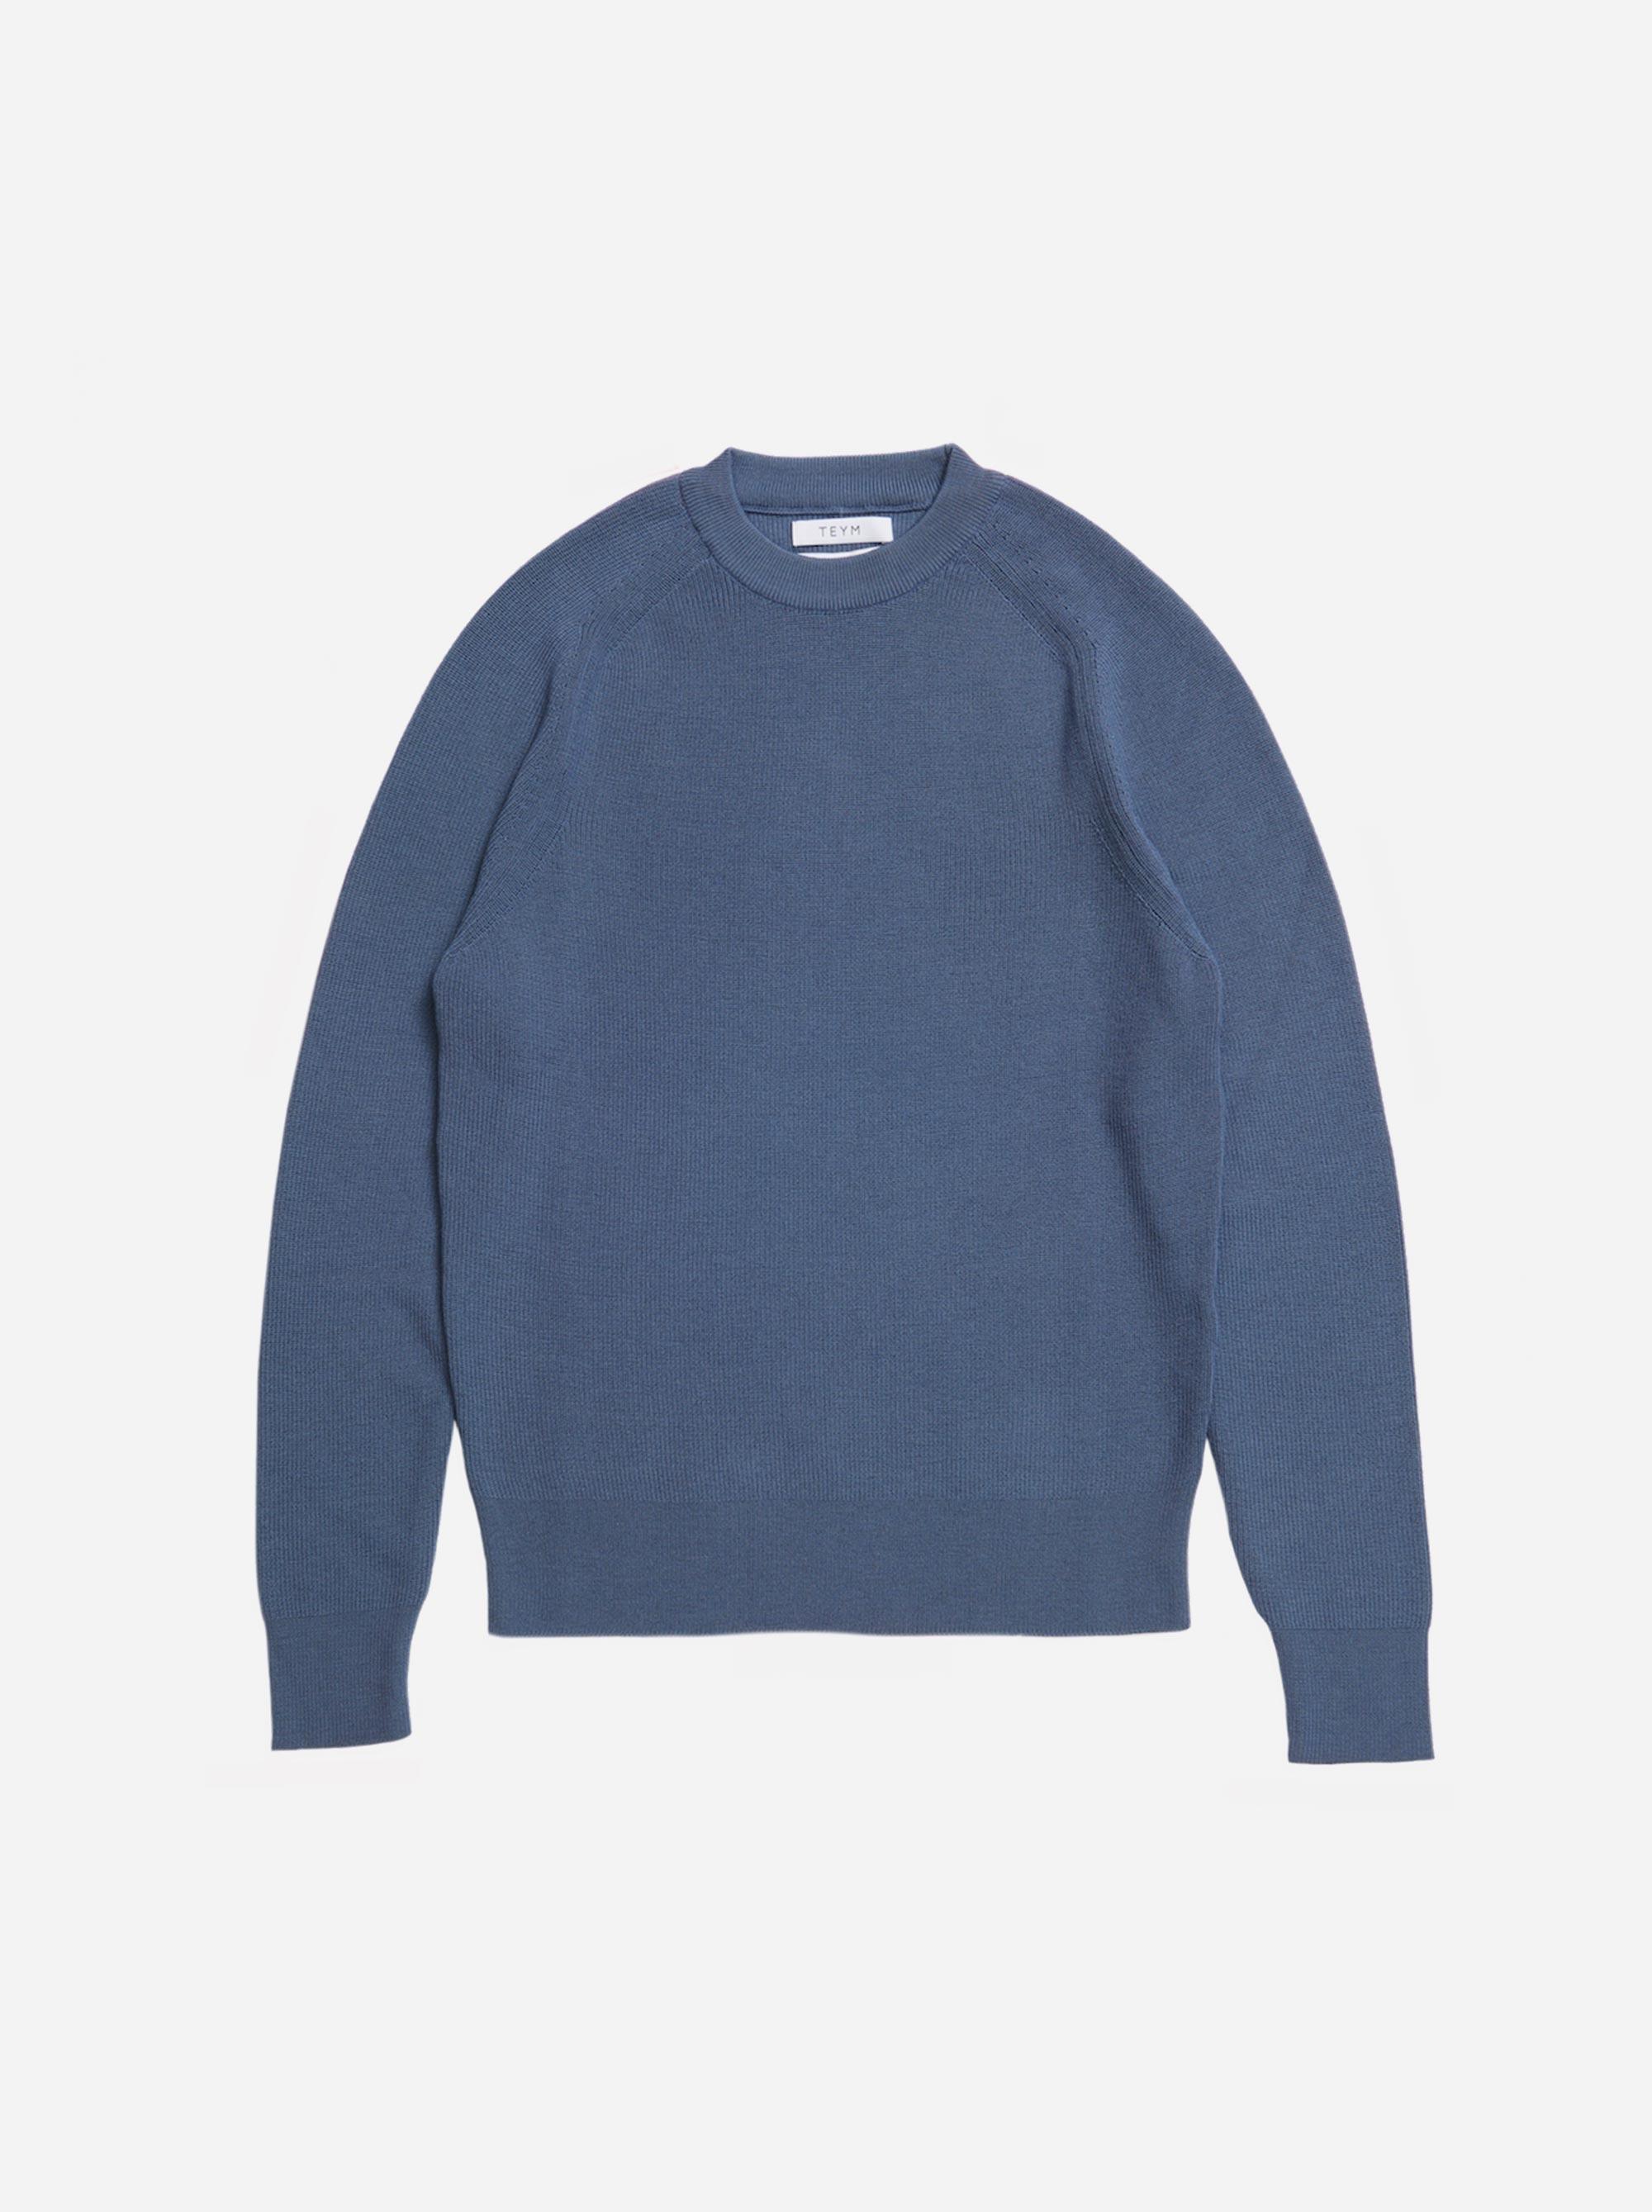 Teym - Crewneck - The Merino Sweater - Women - Sky blue - 4